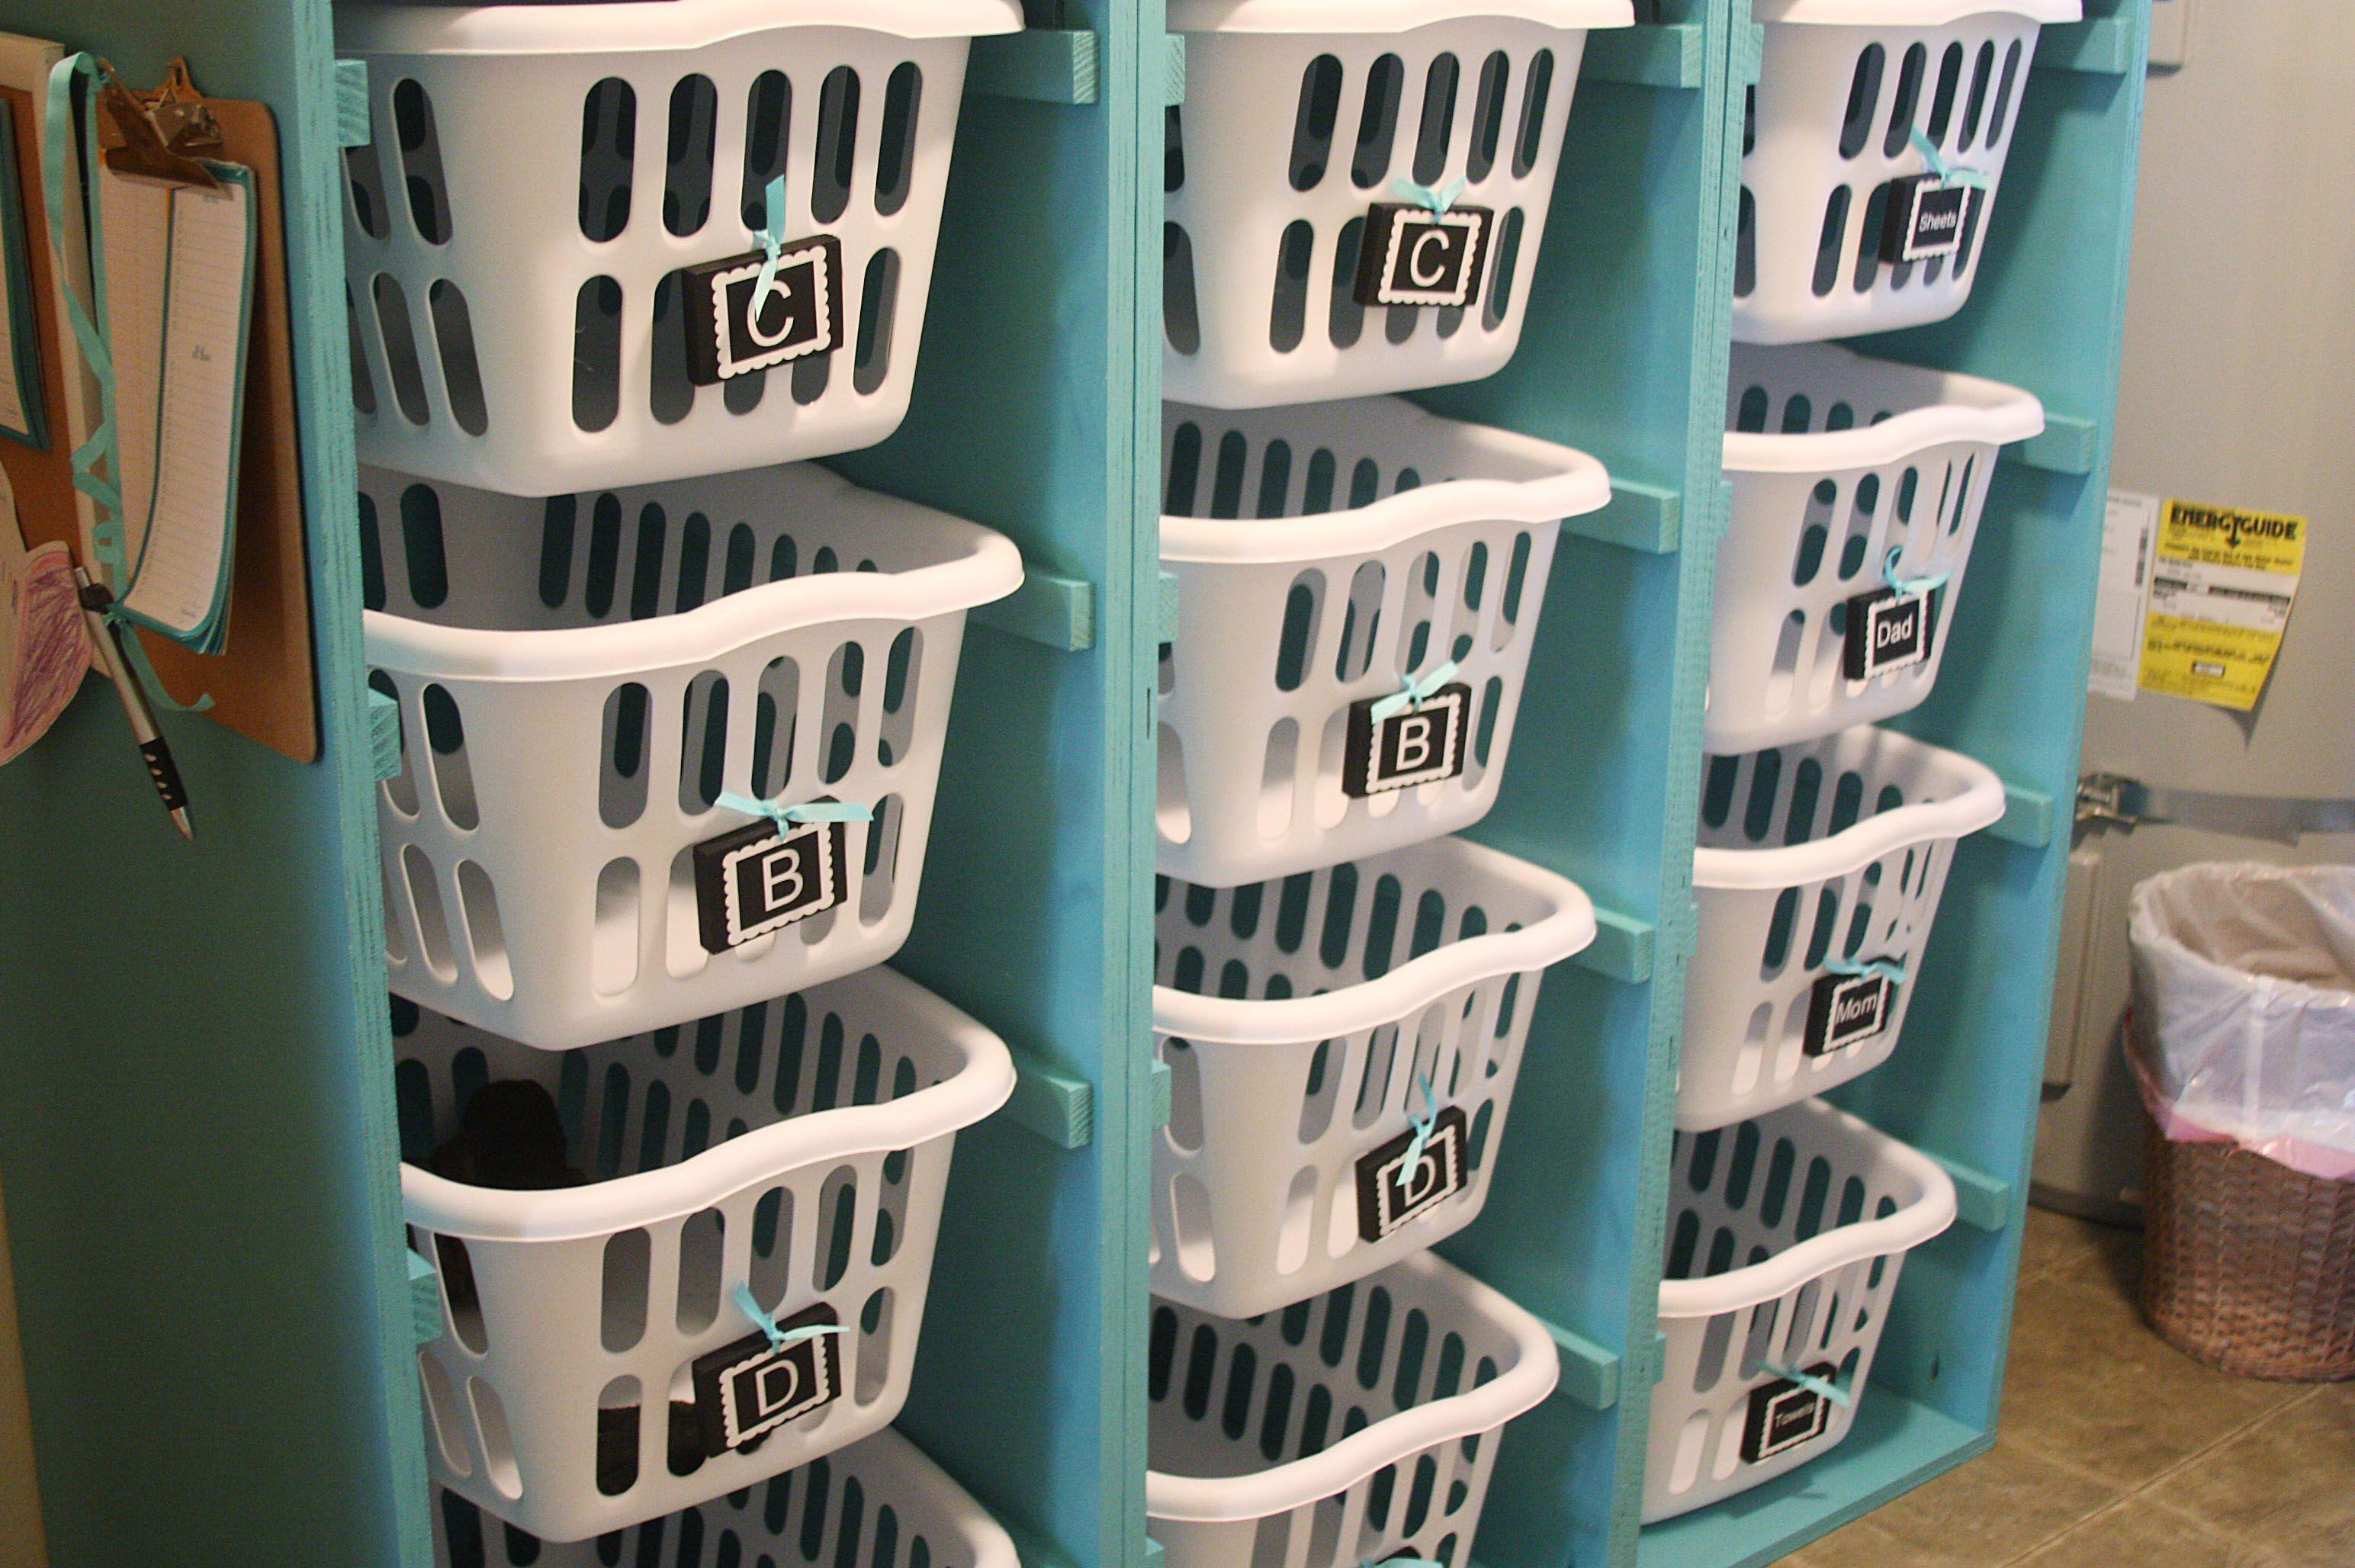 Laundrydressers craftydiy doodahs pinterest laundry laundry